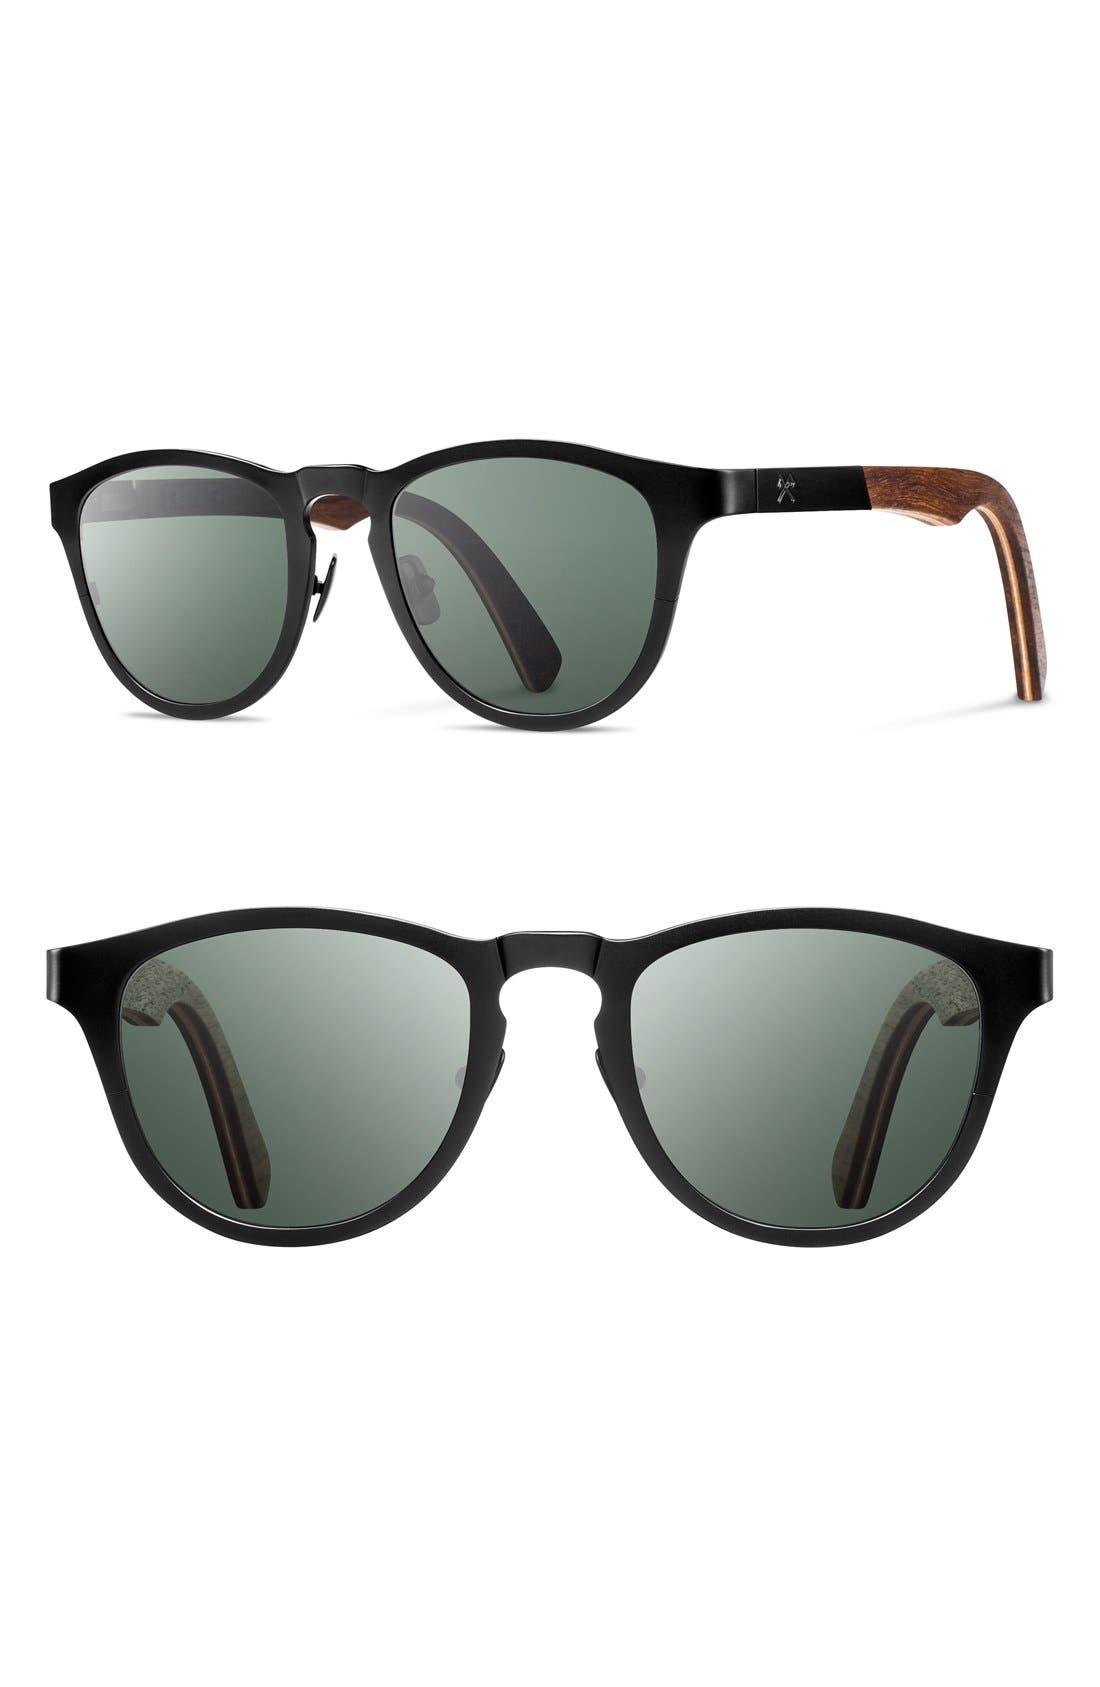 'Francis' 49mm Polarized Titanium & Wood Sunglasses,                             Main thumbnail 1, color,                             001